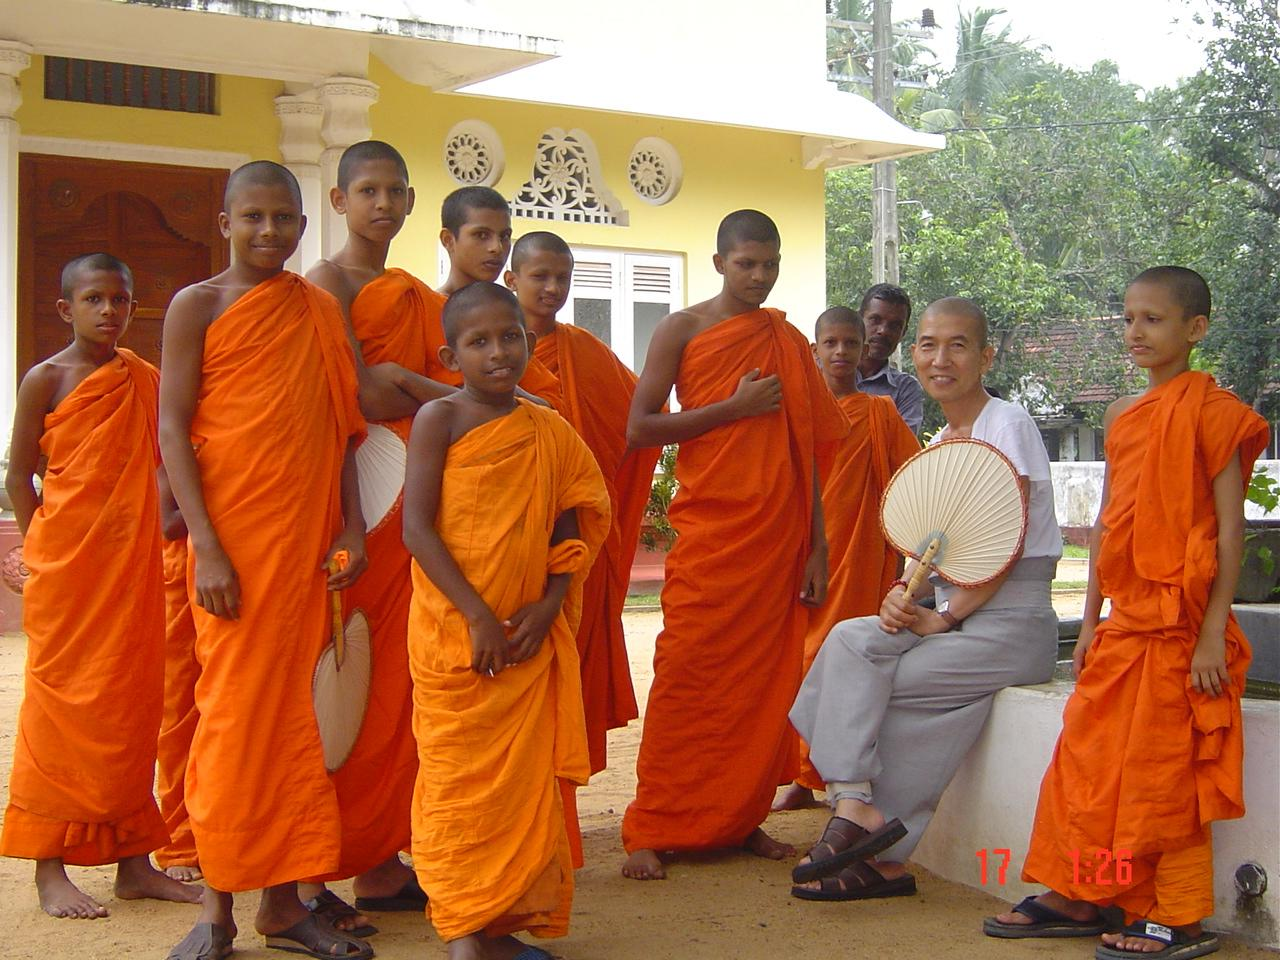 Volunteering in Sri Lanka | Projects Abroad